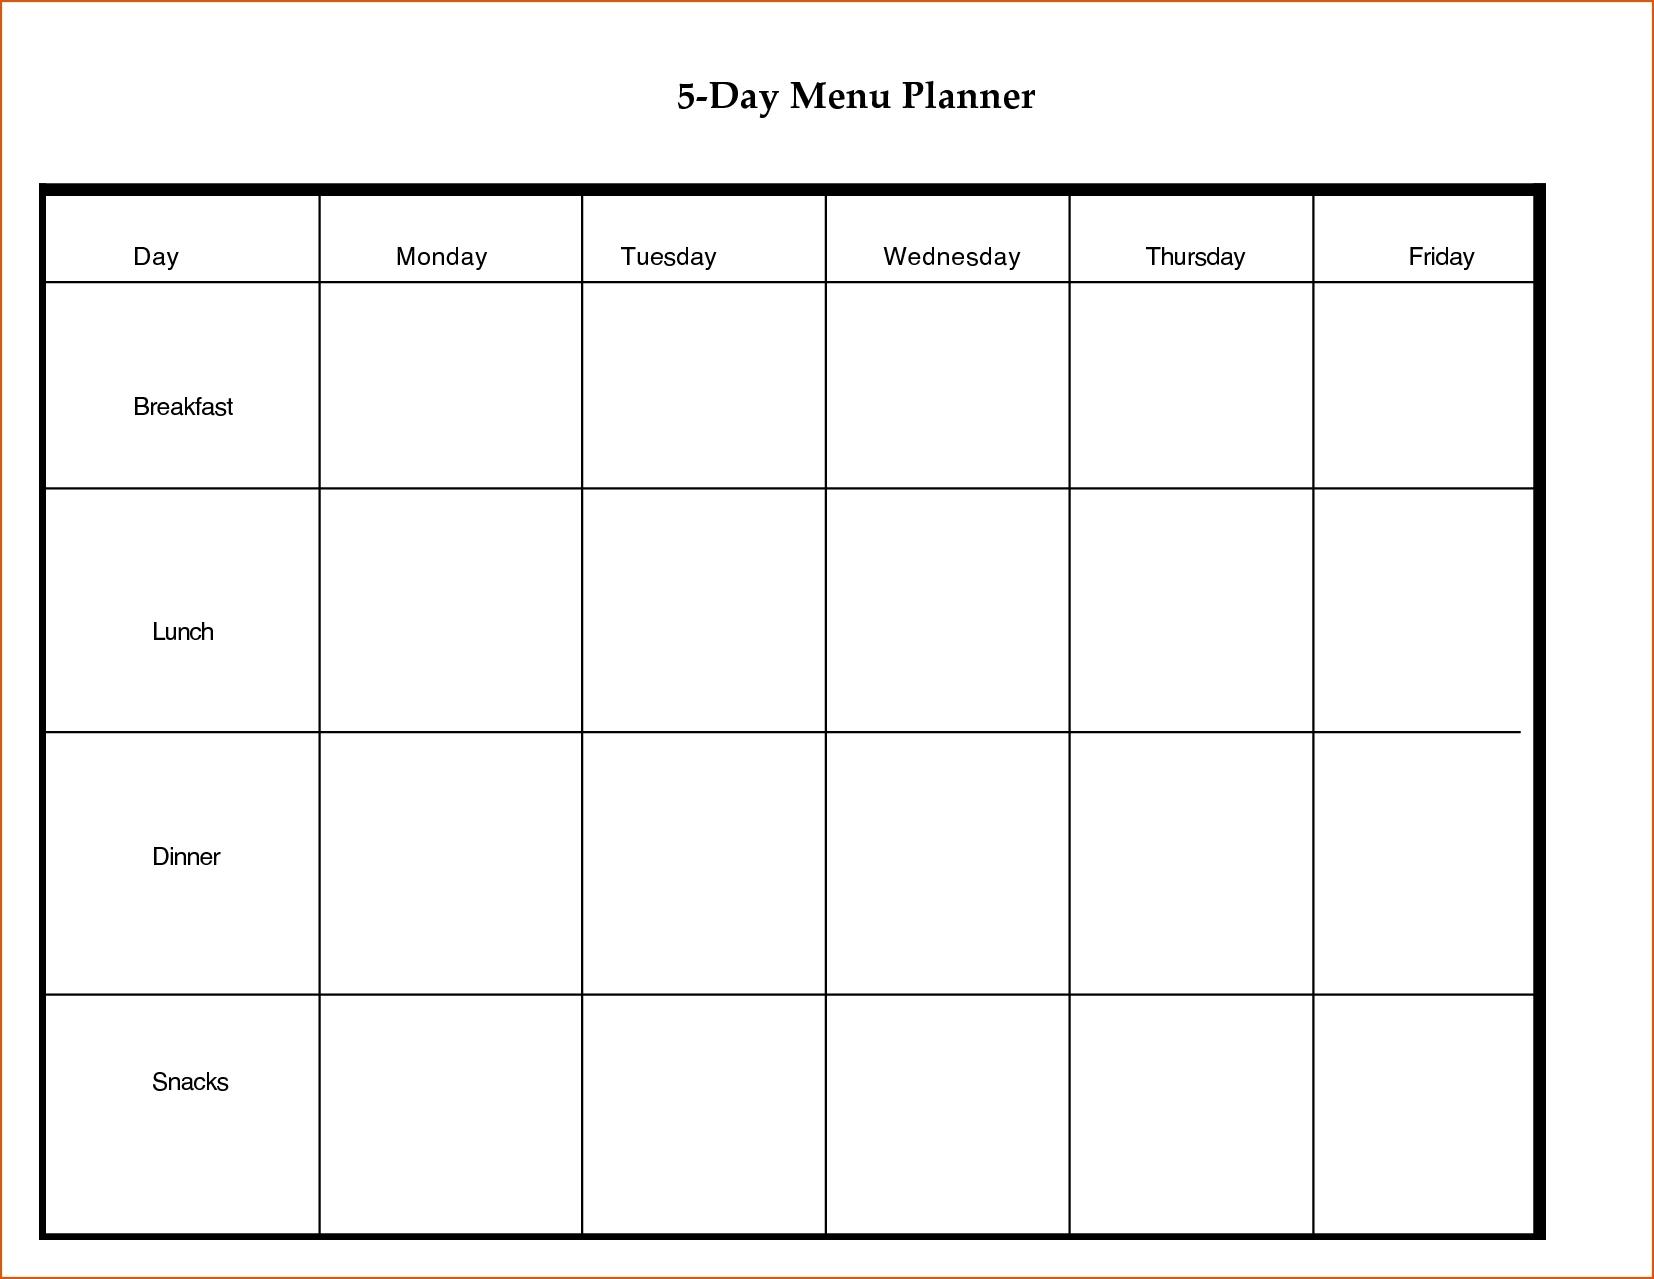 Monthly 5 Week Menu Rotation Template | Template Calendar Printable with regard to Monthly 5 Week Menu Rotation Template